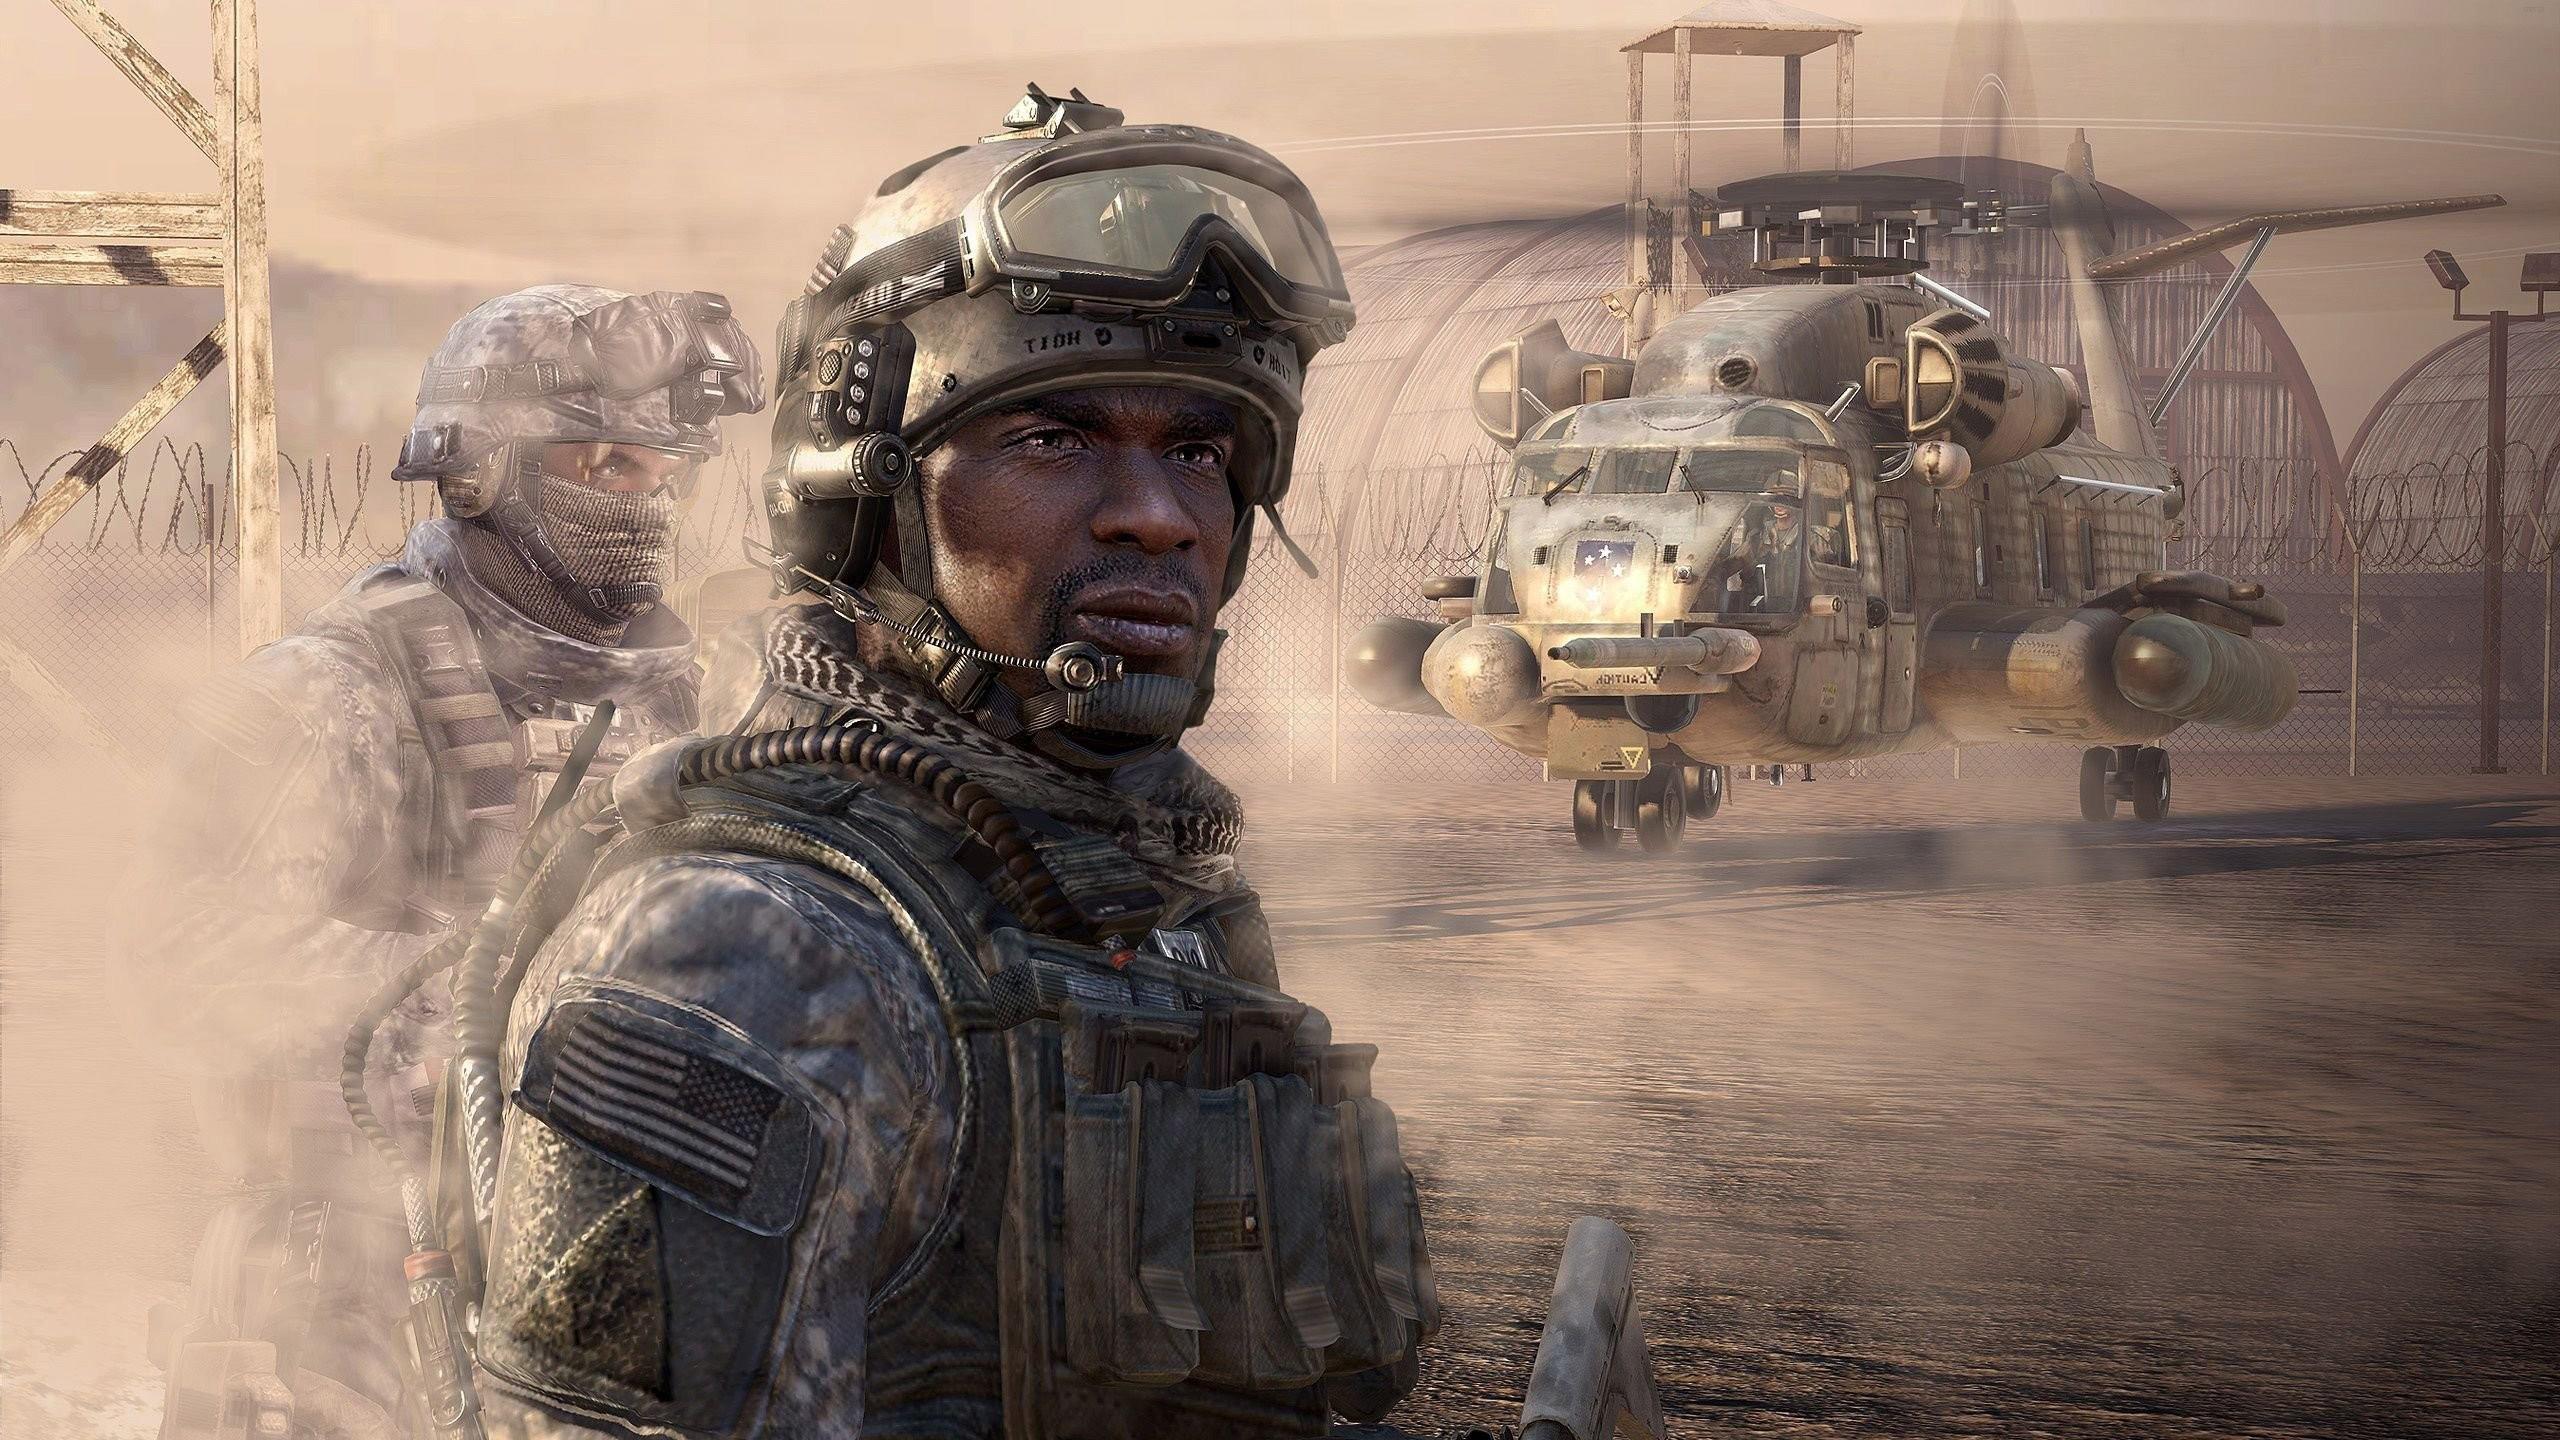 call of duty wallpapers Call of Duty Wallpapers, Cheats Call Of Duty 4 Wallpapers  Wallpapers)